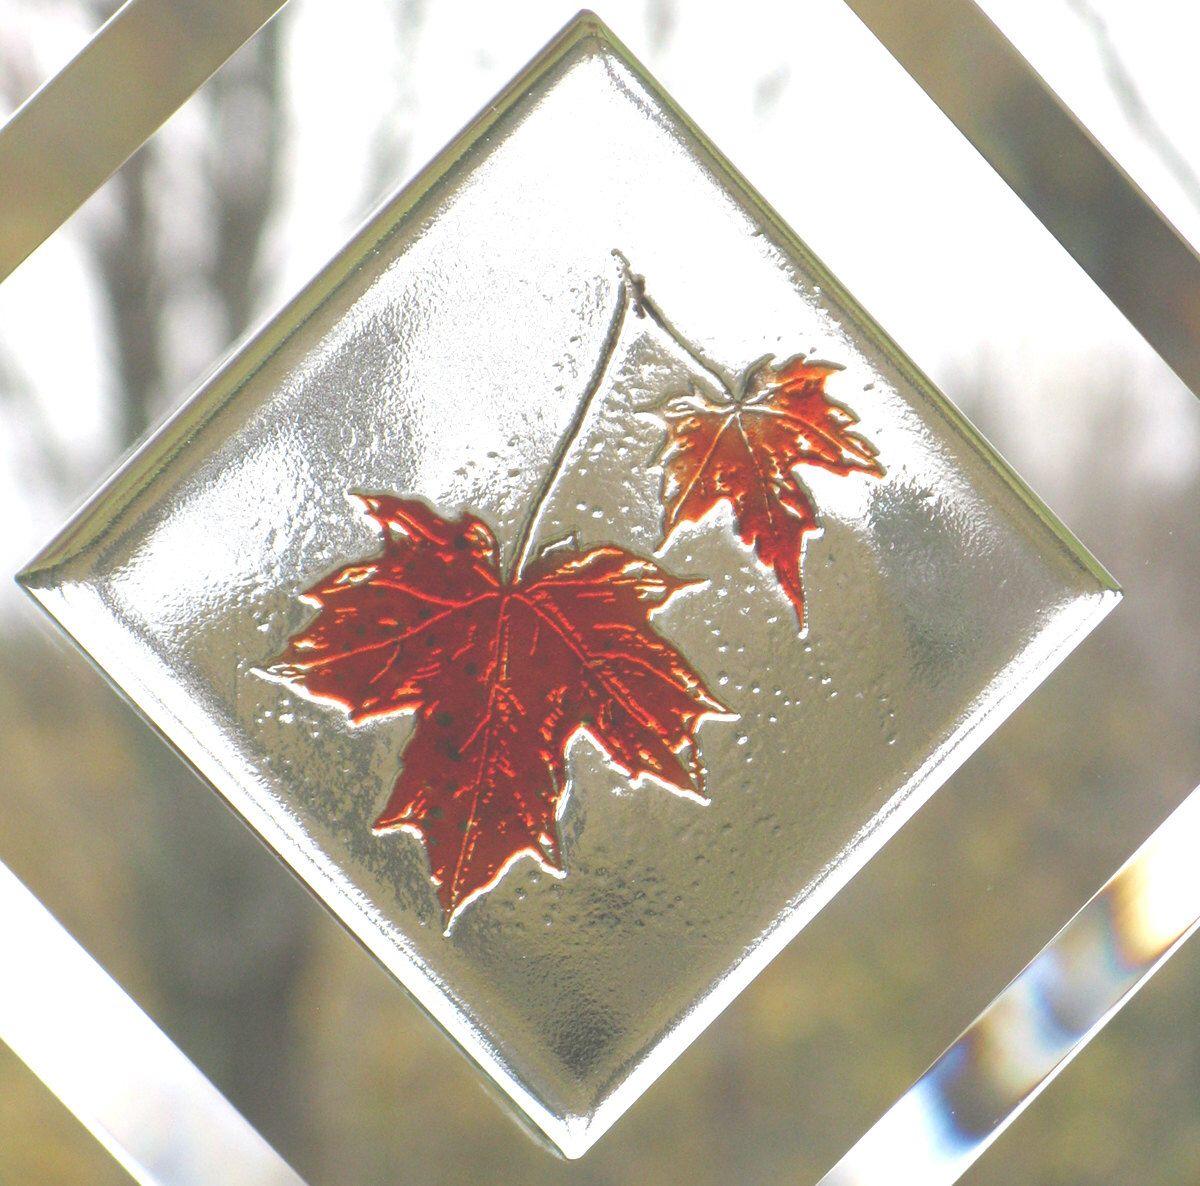 Maple Leaves, Engraved Maple Leaf  Suncatcher,  Maple Leaf Bevel Window Hanging, Fused Glass Maple Leaf, Engraved Maple Leaf,  BV121 by RavenGlassStudio on Etsy https://www.etsy.com/listing/208483557/maple-leaves-engraved-maple-leaf